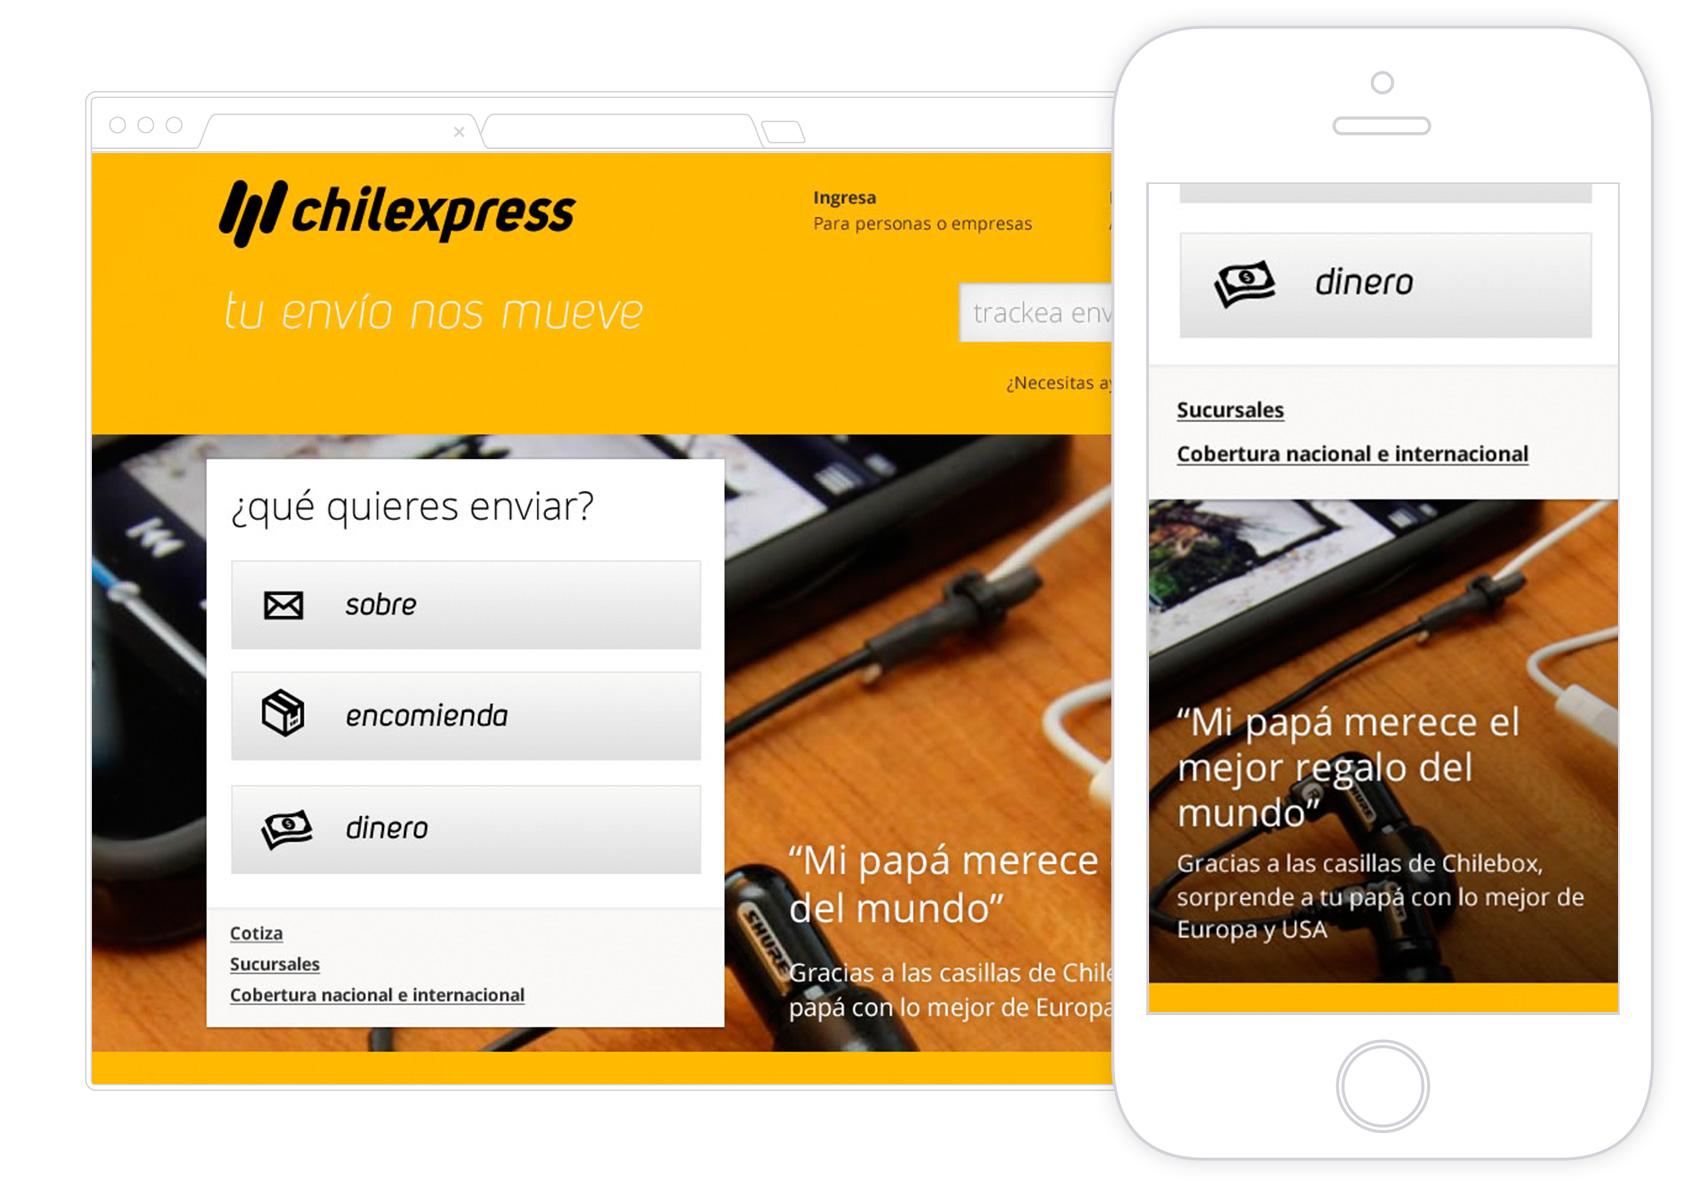 06-chilexpress-browser.jpg